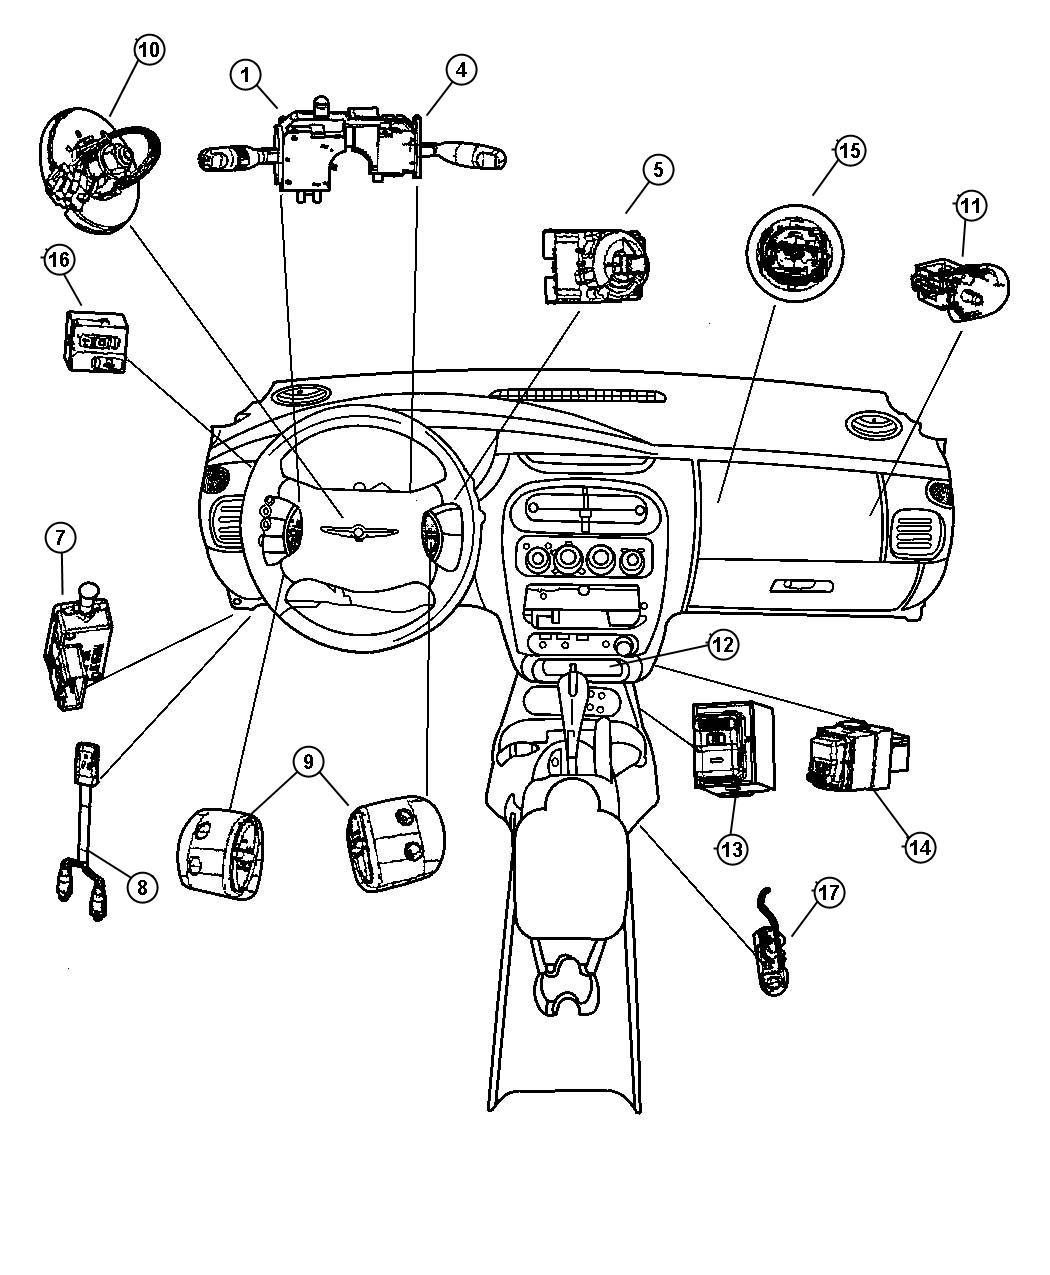 Dodge Neon Clockspring. Three circuit, three circuit